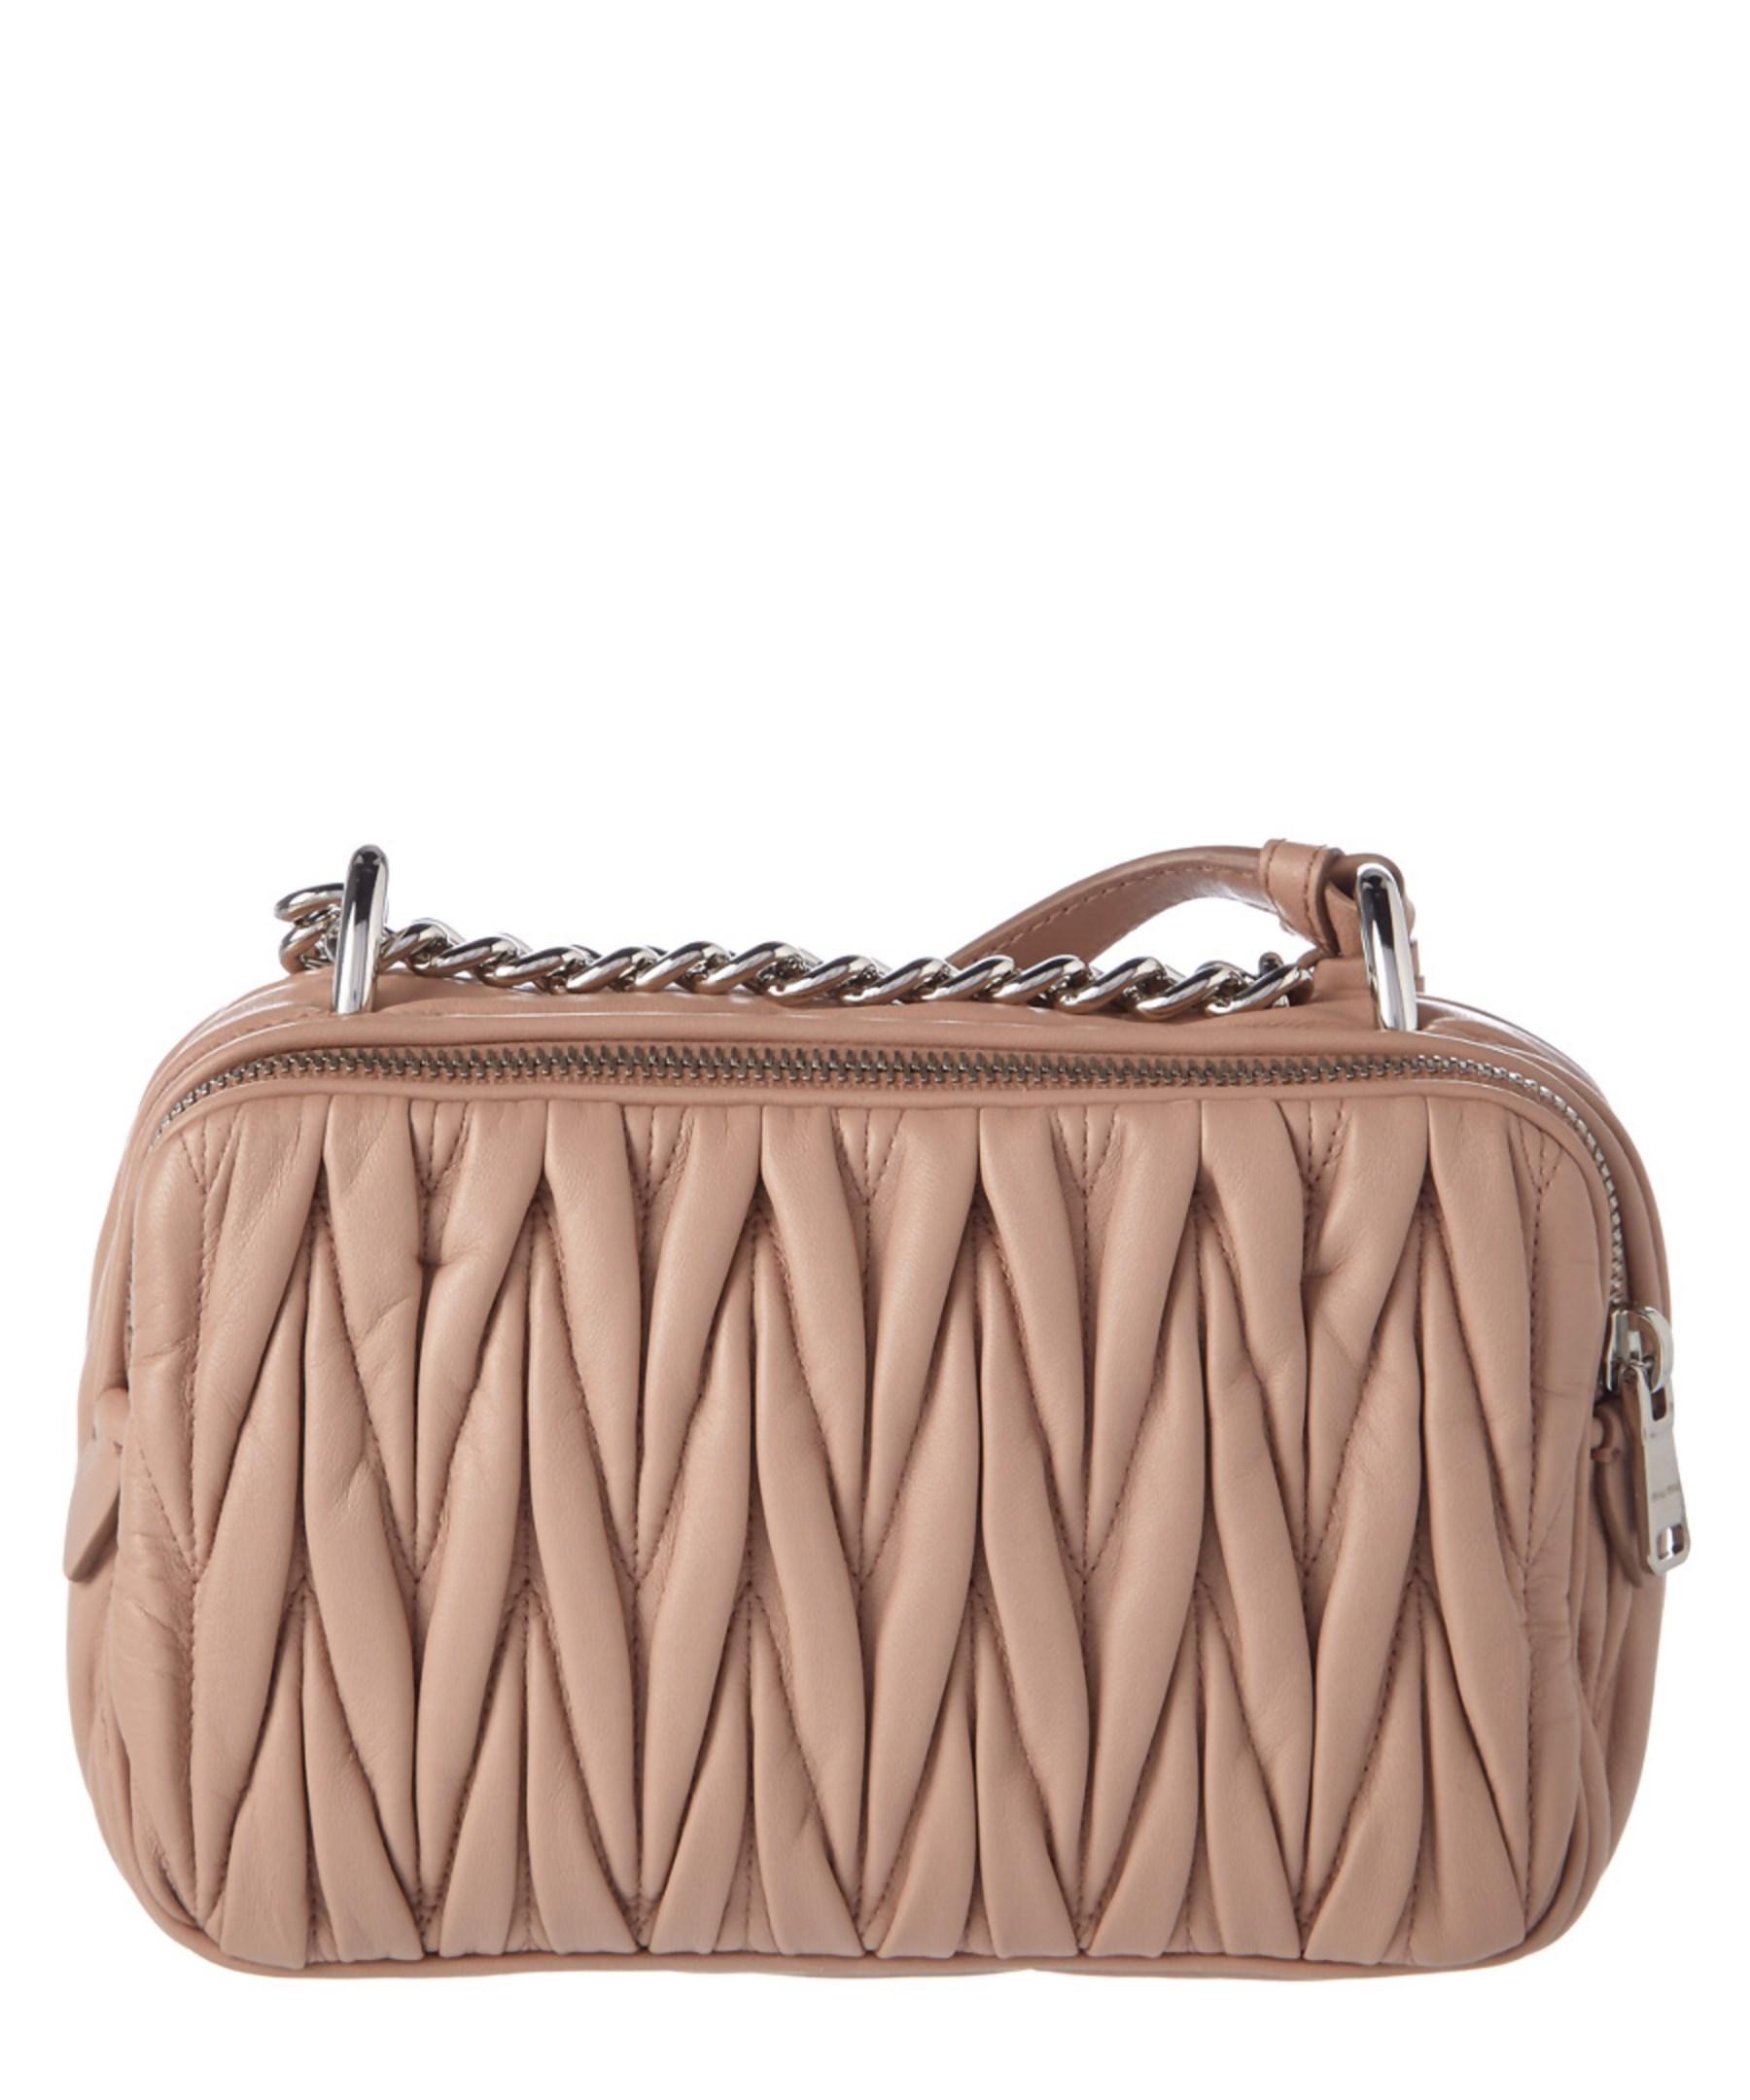 519313408d1e Lyst - Miu miu Matelasse Leather Camera Bag Bag in Pink